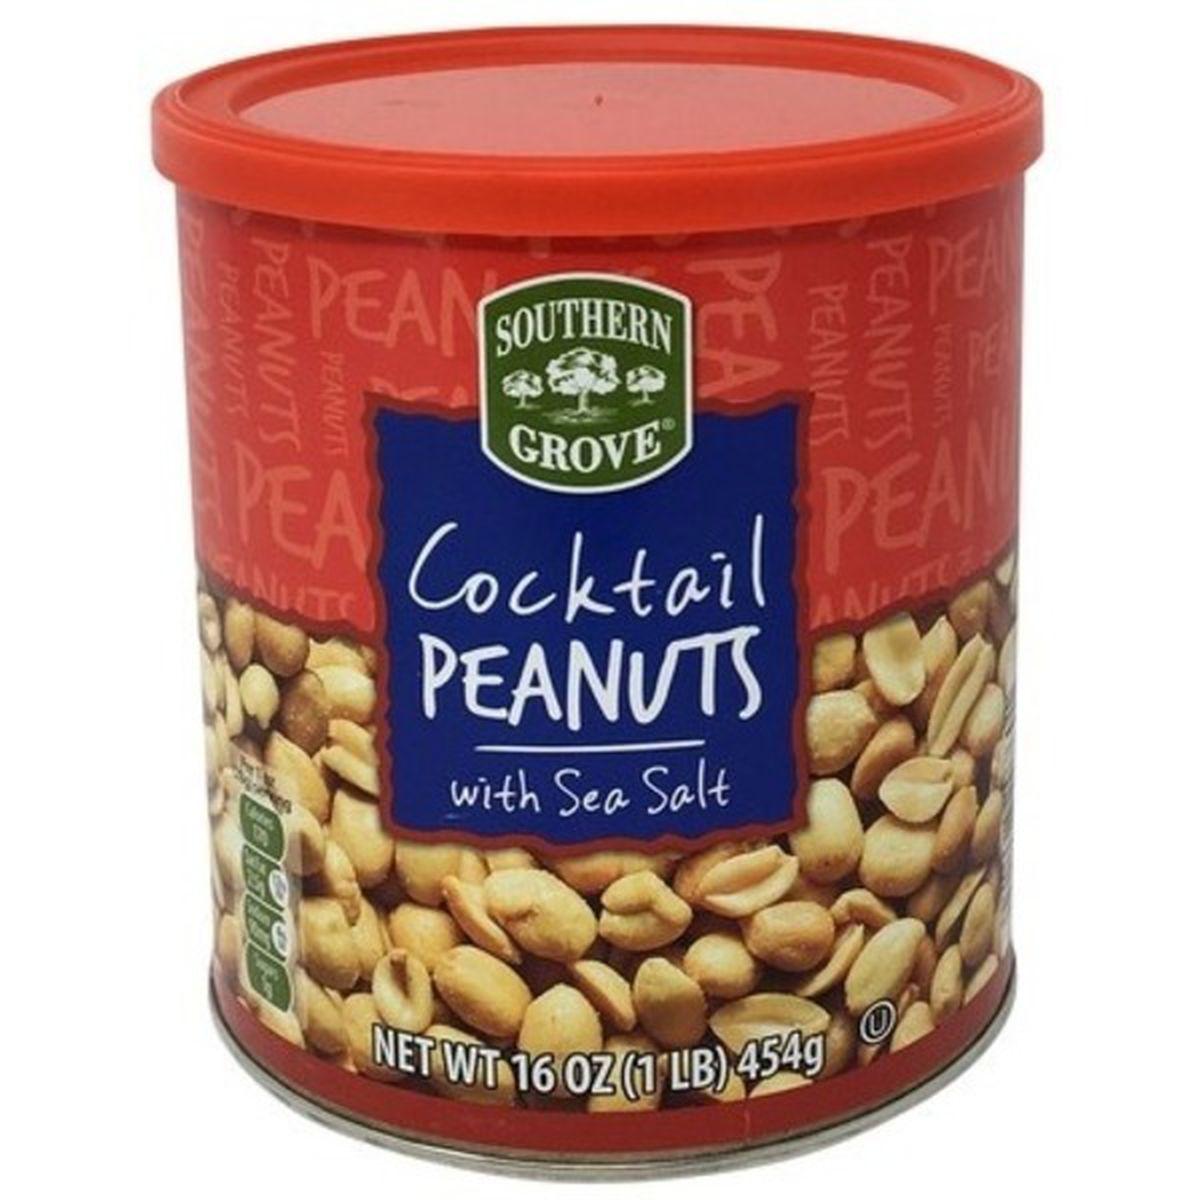 Cocktail Peanuts